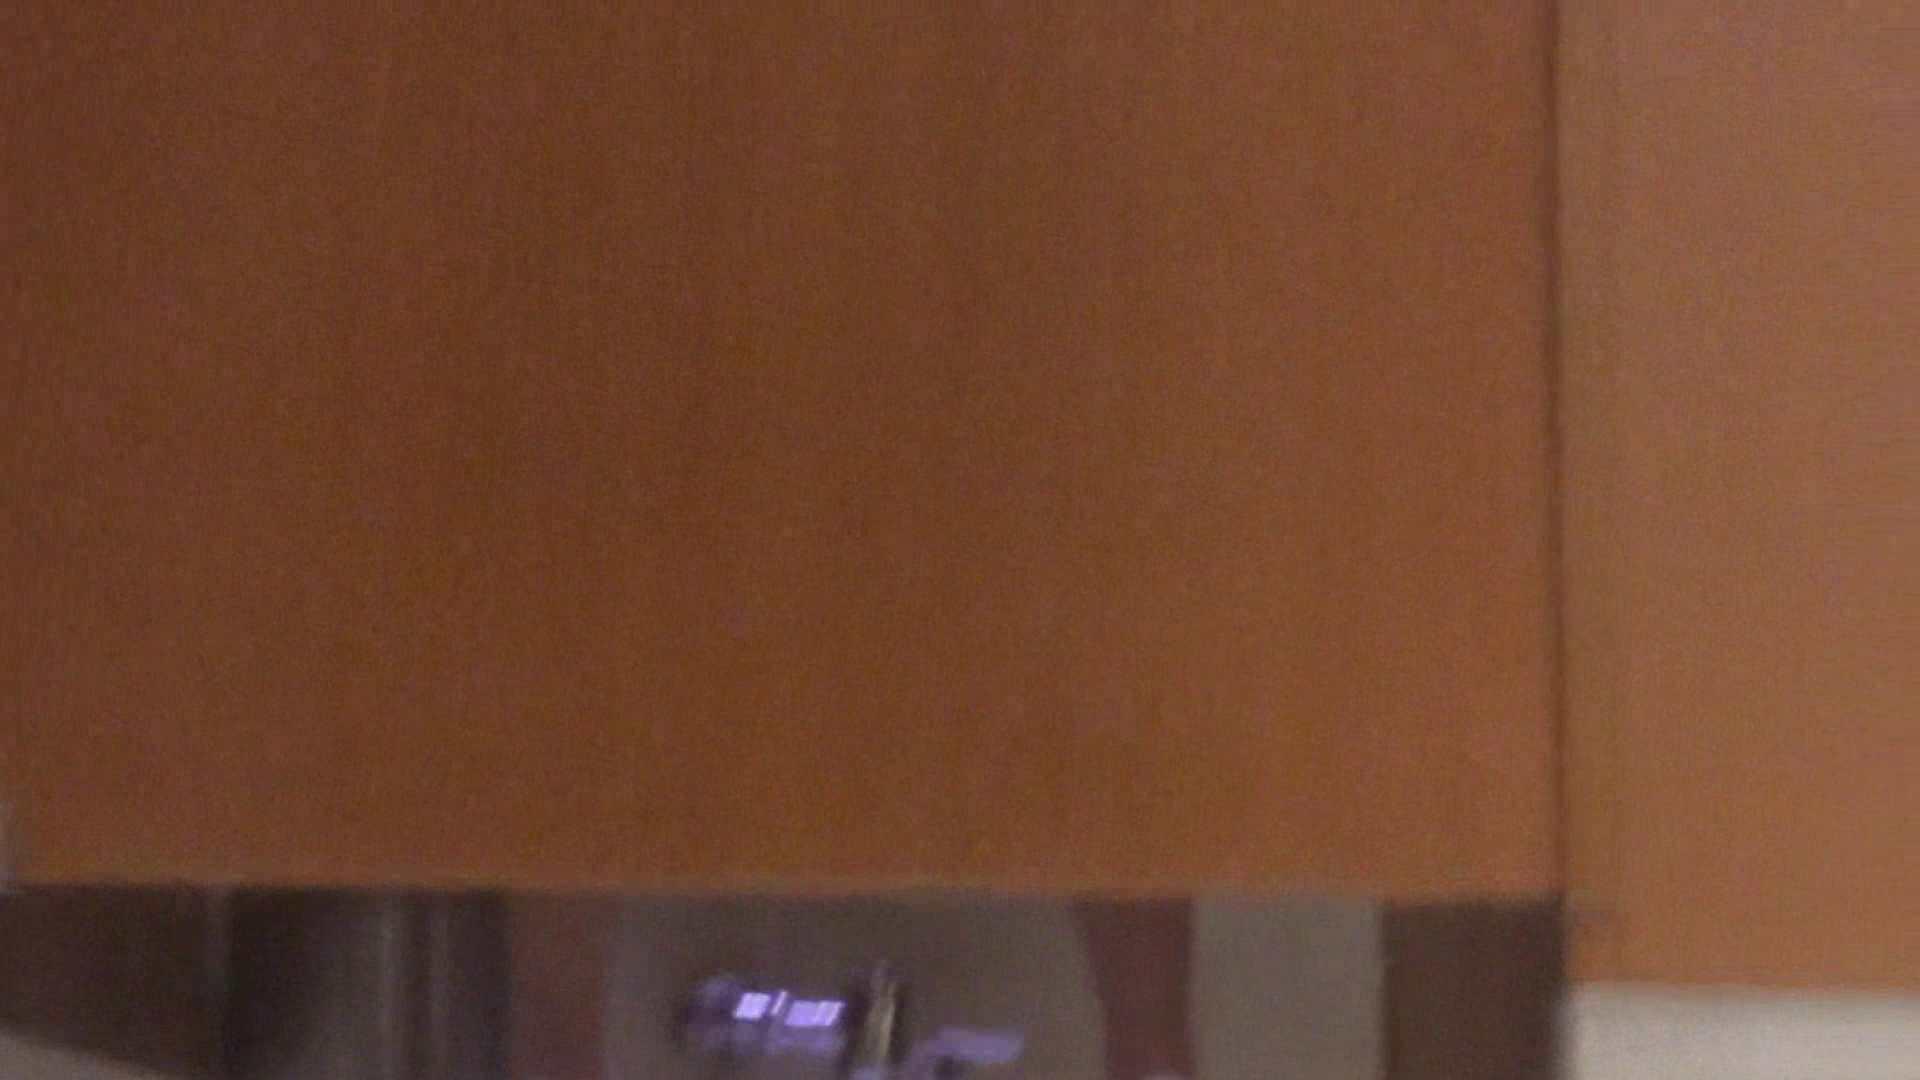 「噂」の国の厠観察日記2 Vol.10 人気シリーズ 盗撮動画紹介 85連発 83